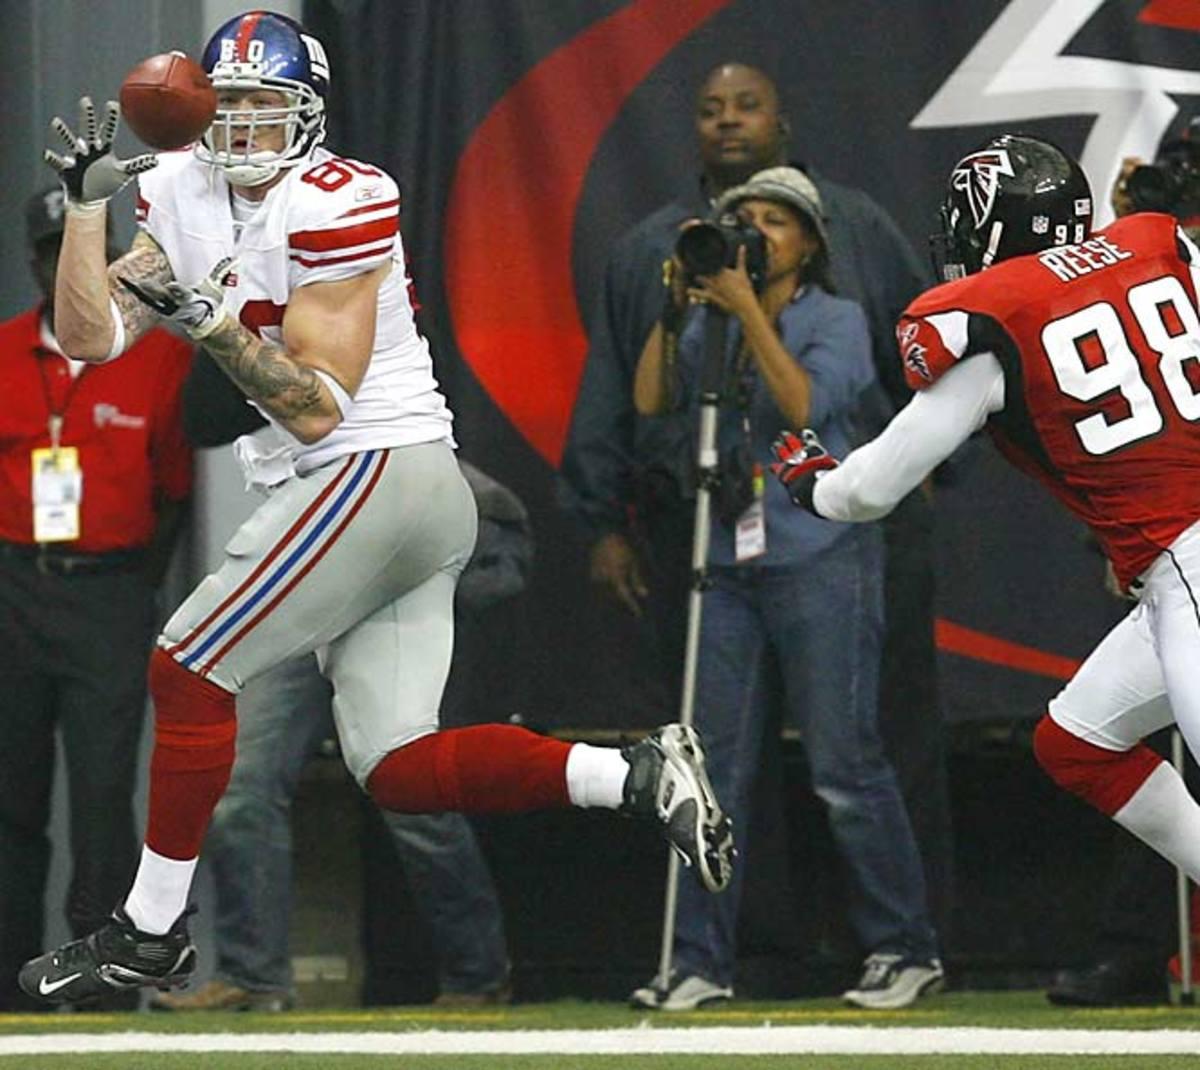 Giants 27, Falcons 14